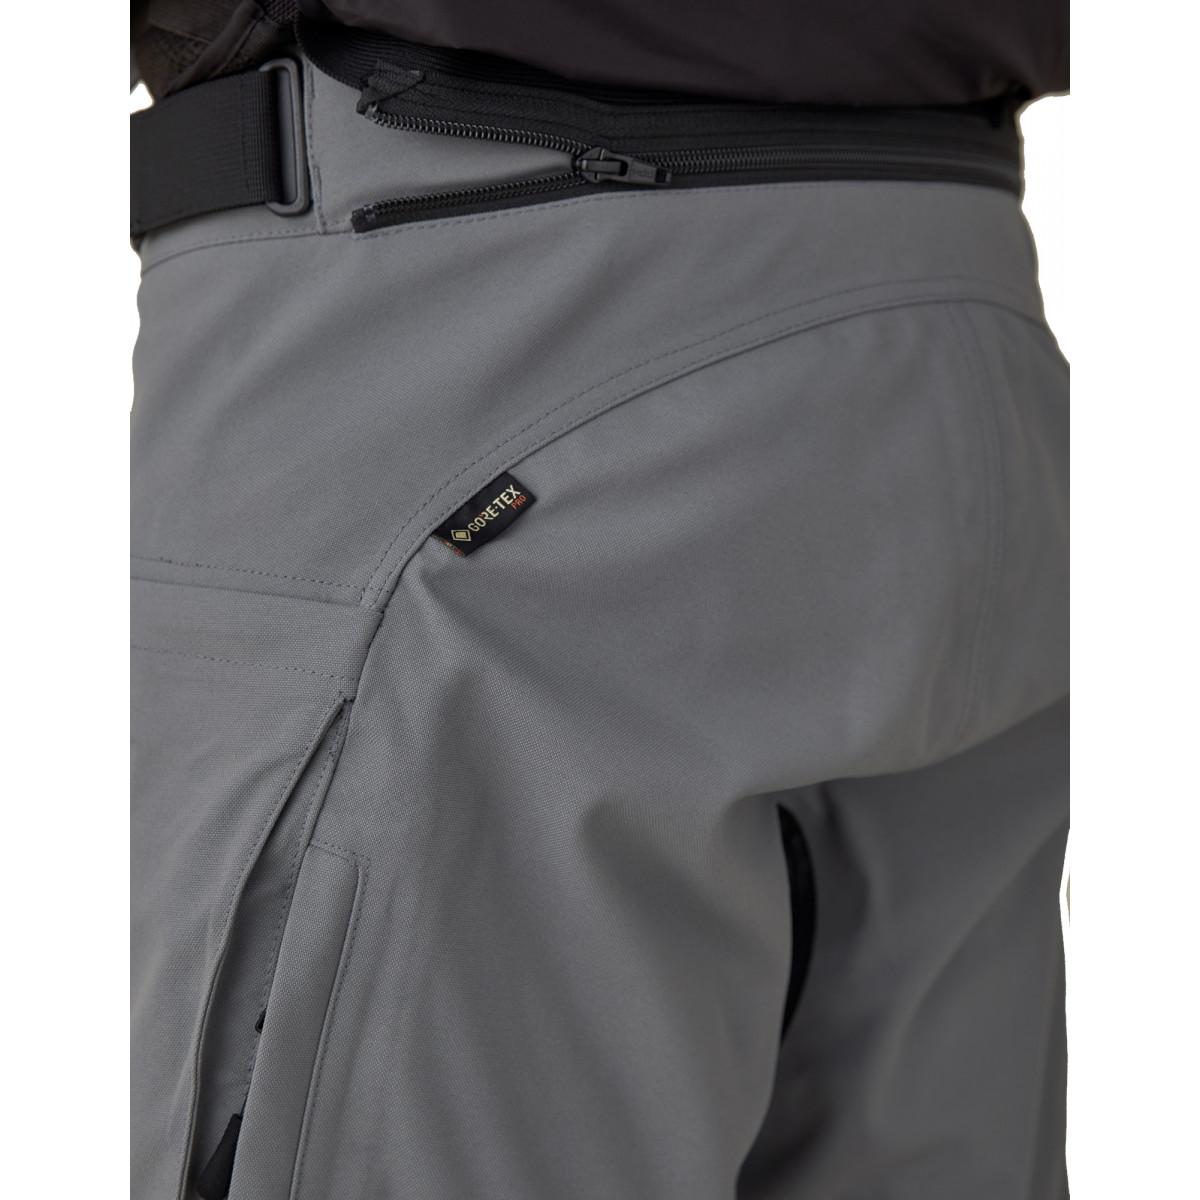 Belstaff Long Way Up Light Grey Trousers